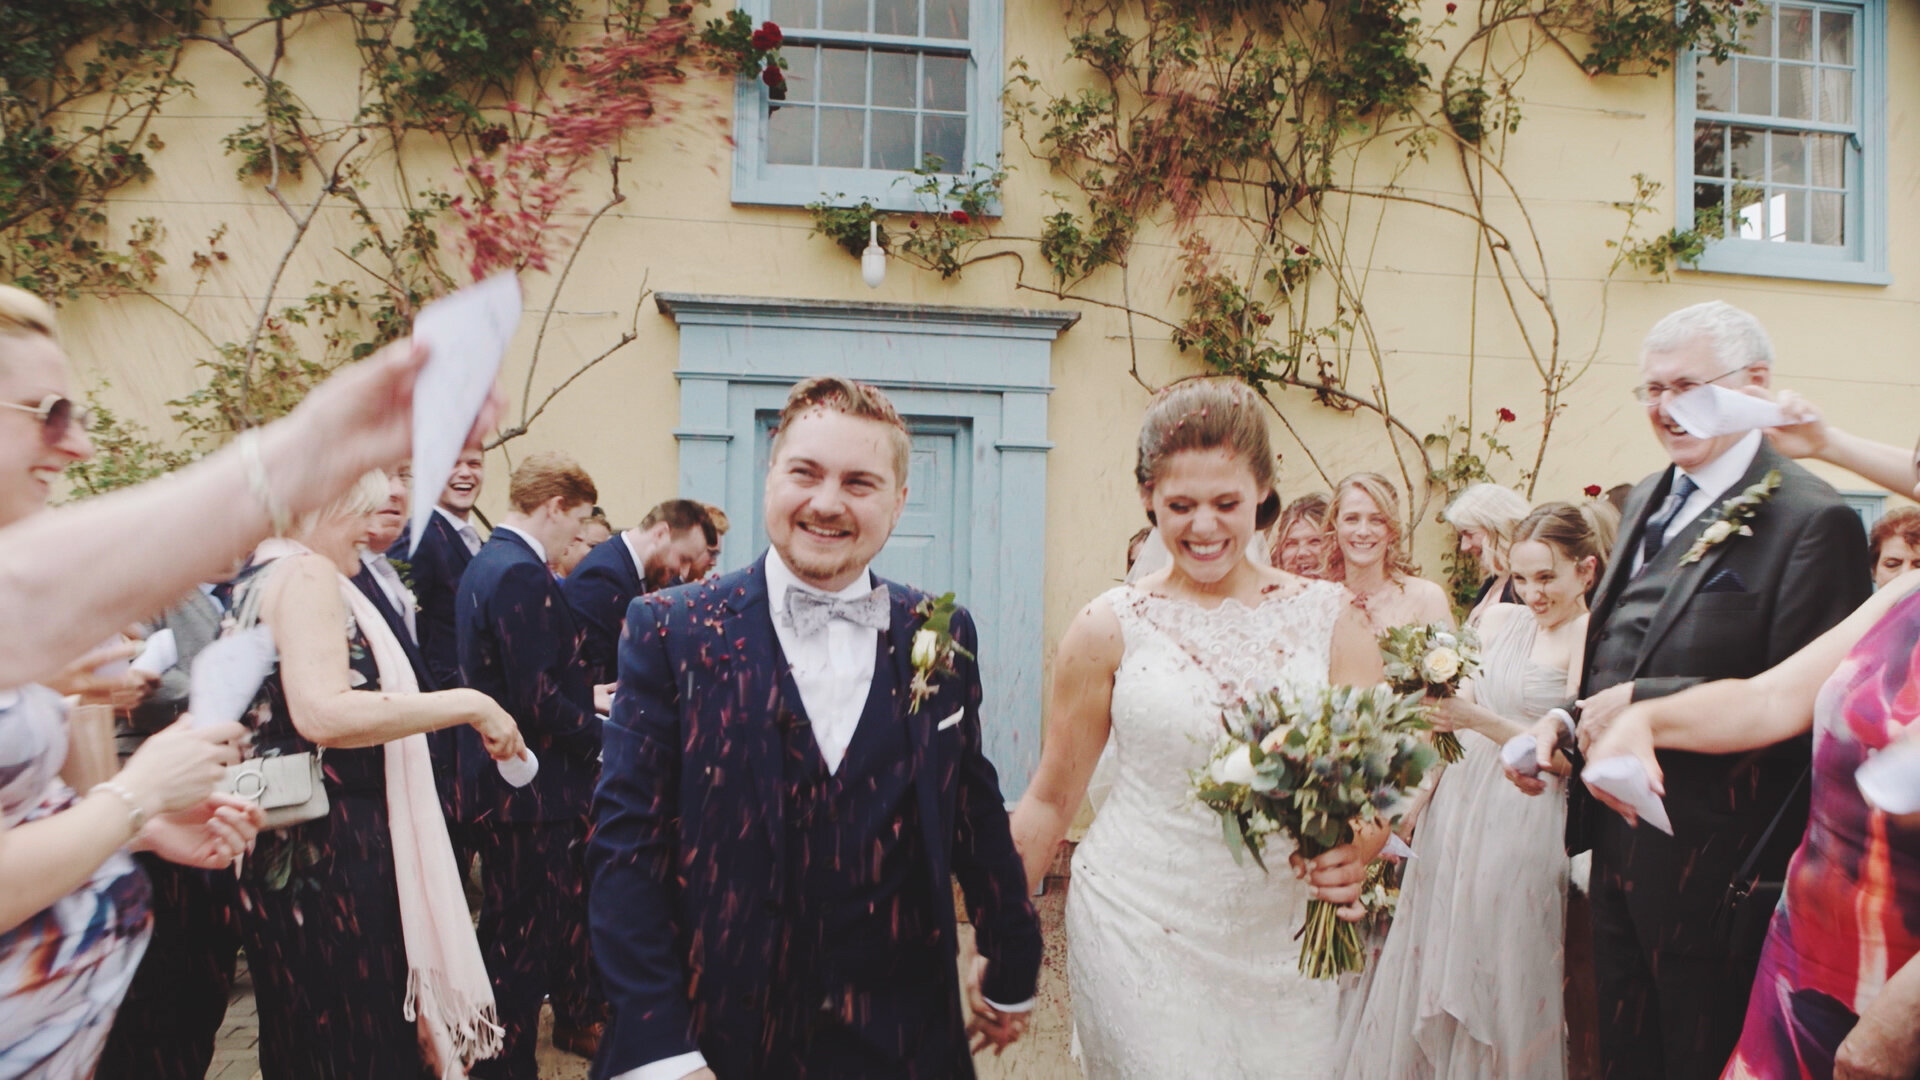 Susanna & Adam - Stills - Context Weddings35.jpg